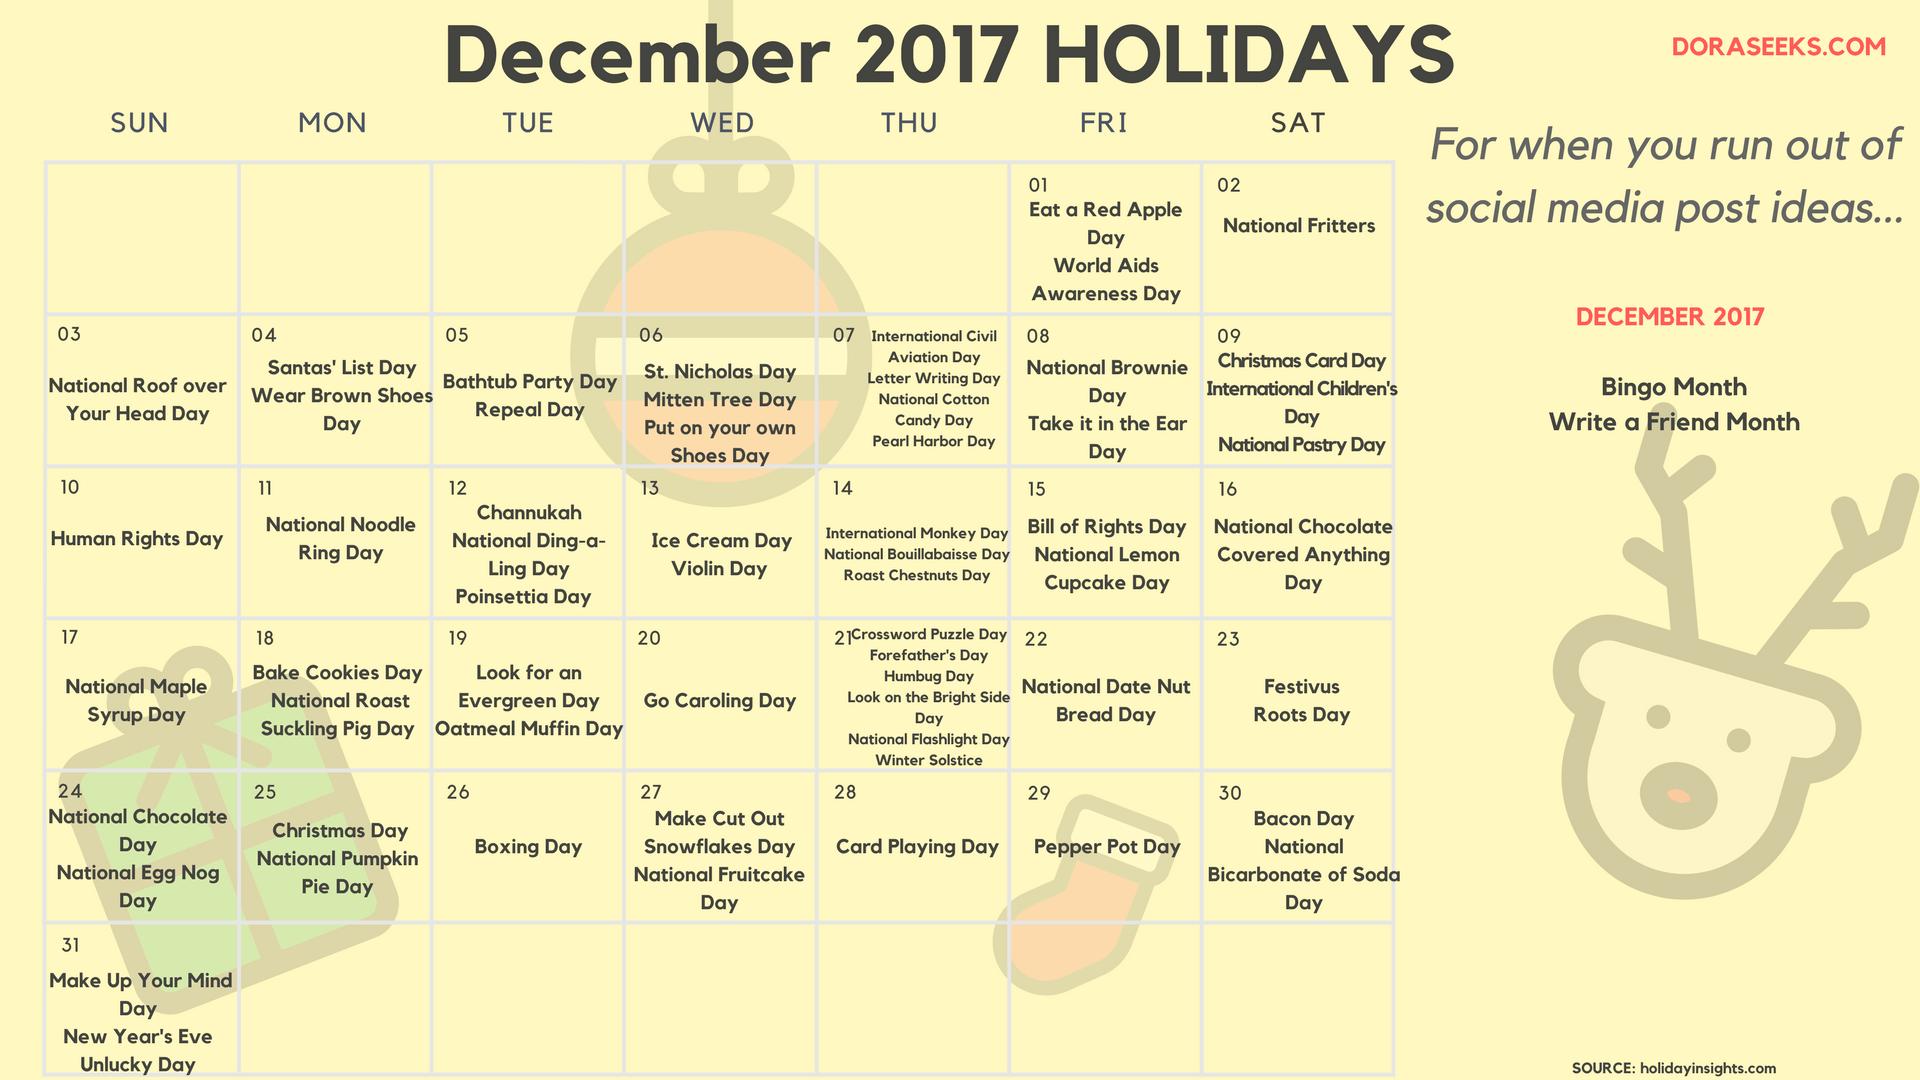 December 2017 Holiday Post Ideas Calendar (Source: holidayinsights.com)